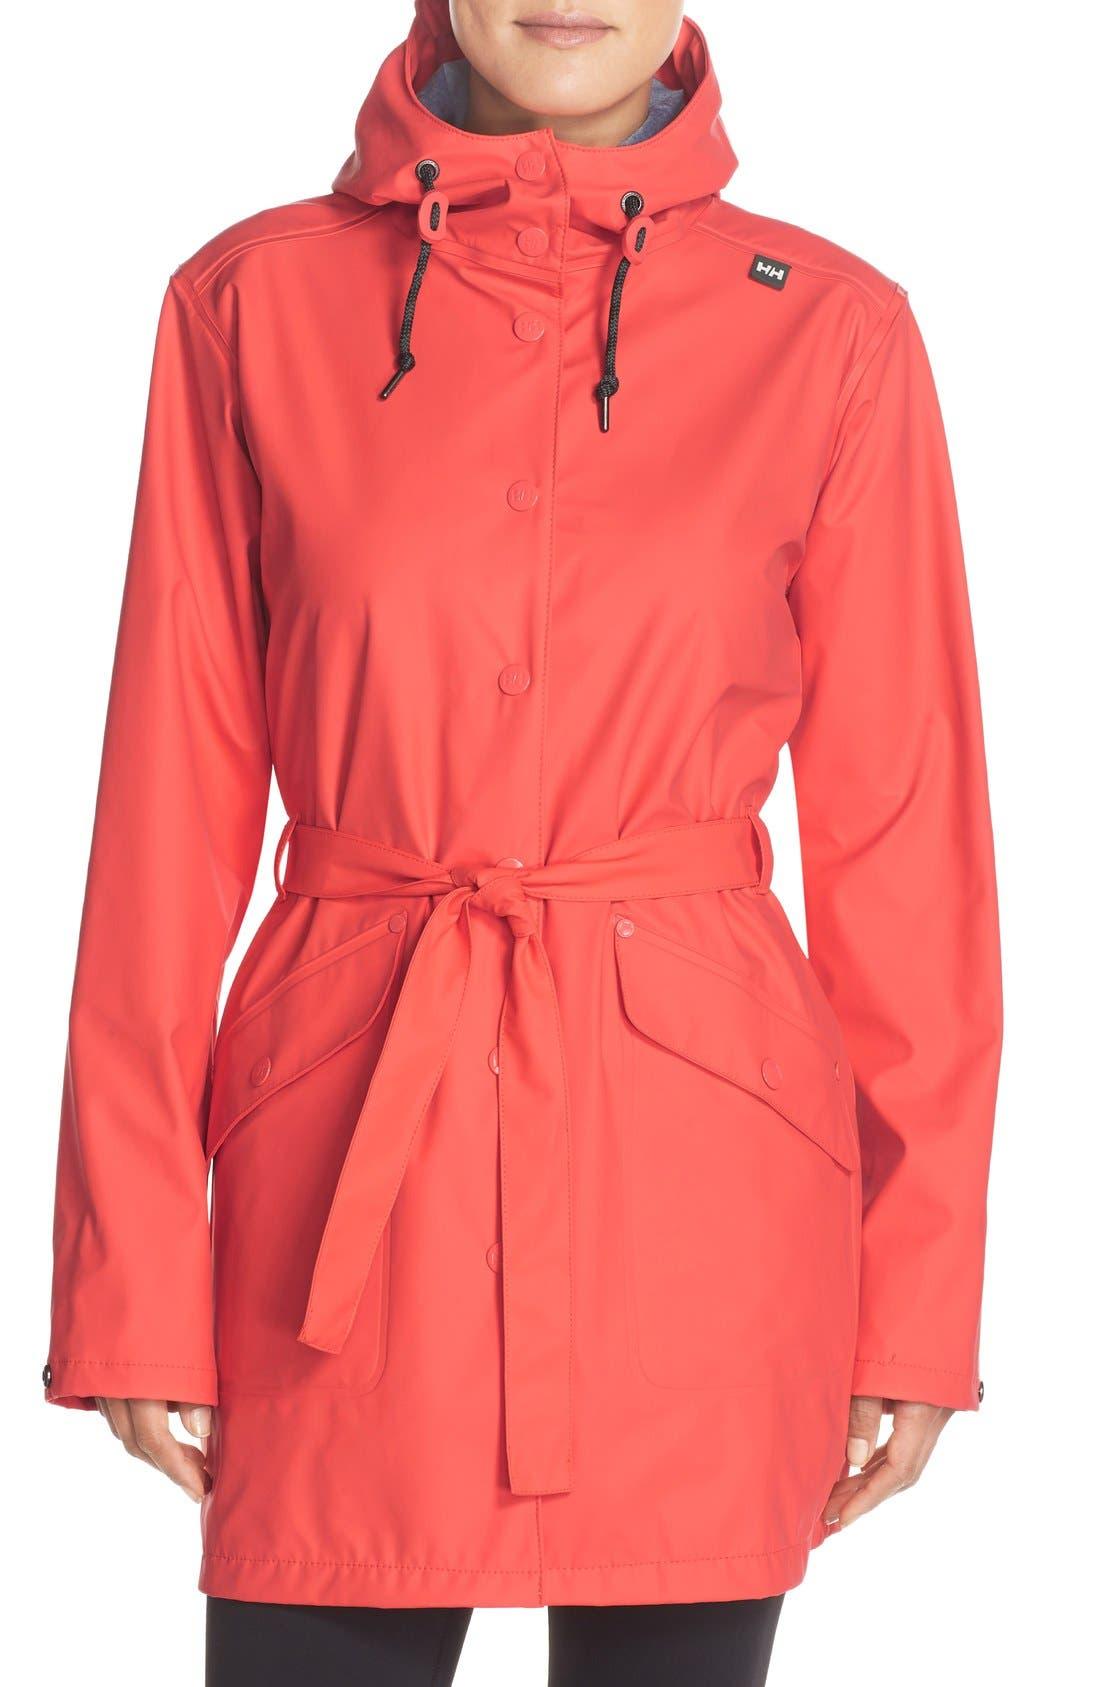 Main Image - Helly Hansen 'Kirkwall' Raincoat